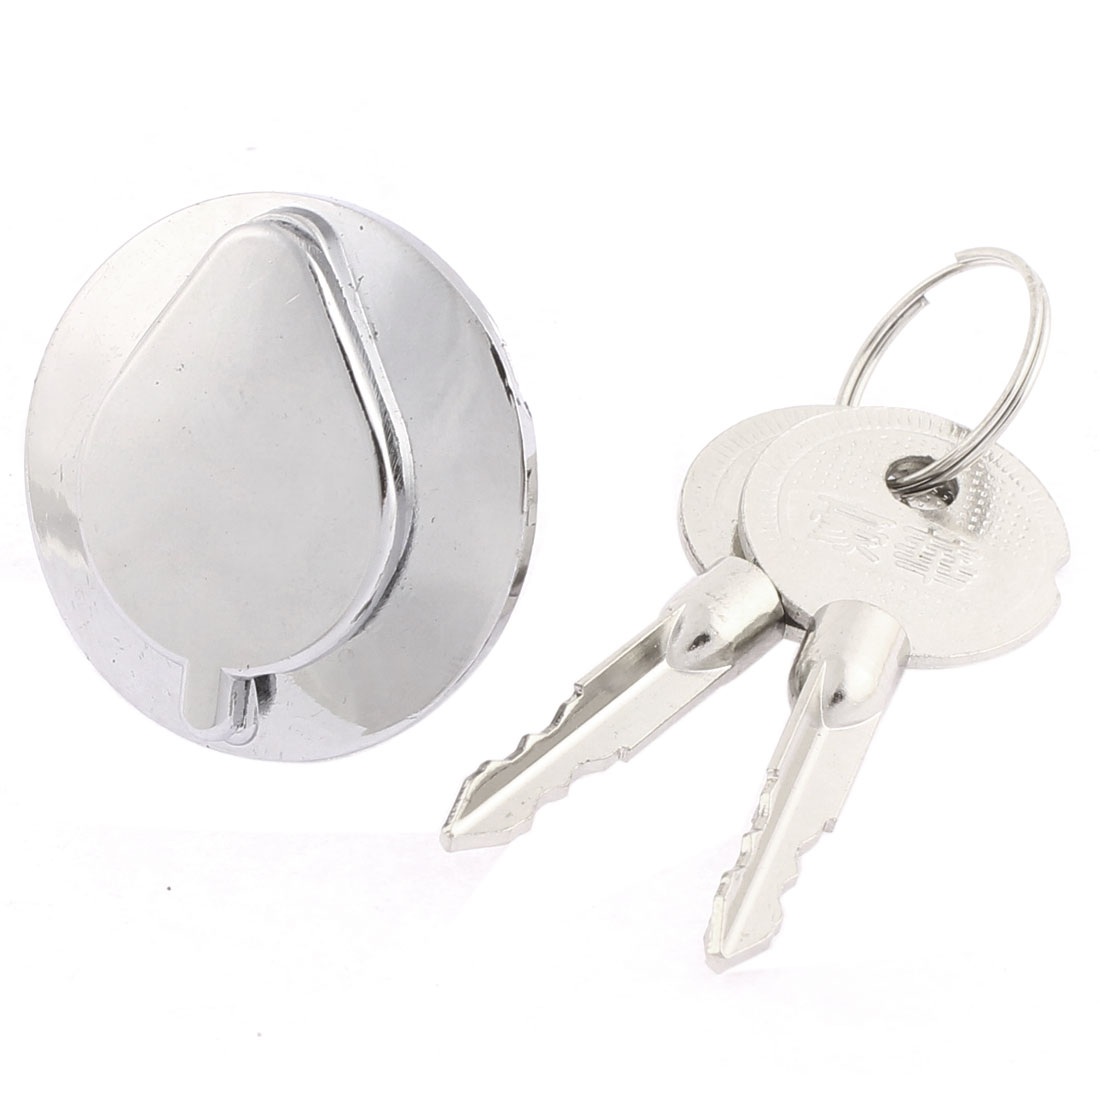 Cabinet Drawer Safety Locking 21mm Thread Cylinder Keyed Cam Lock